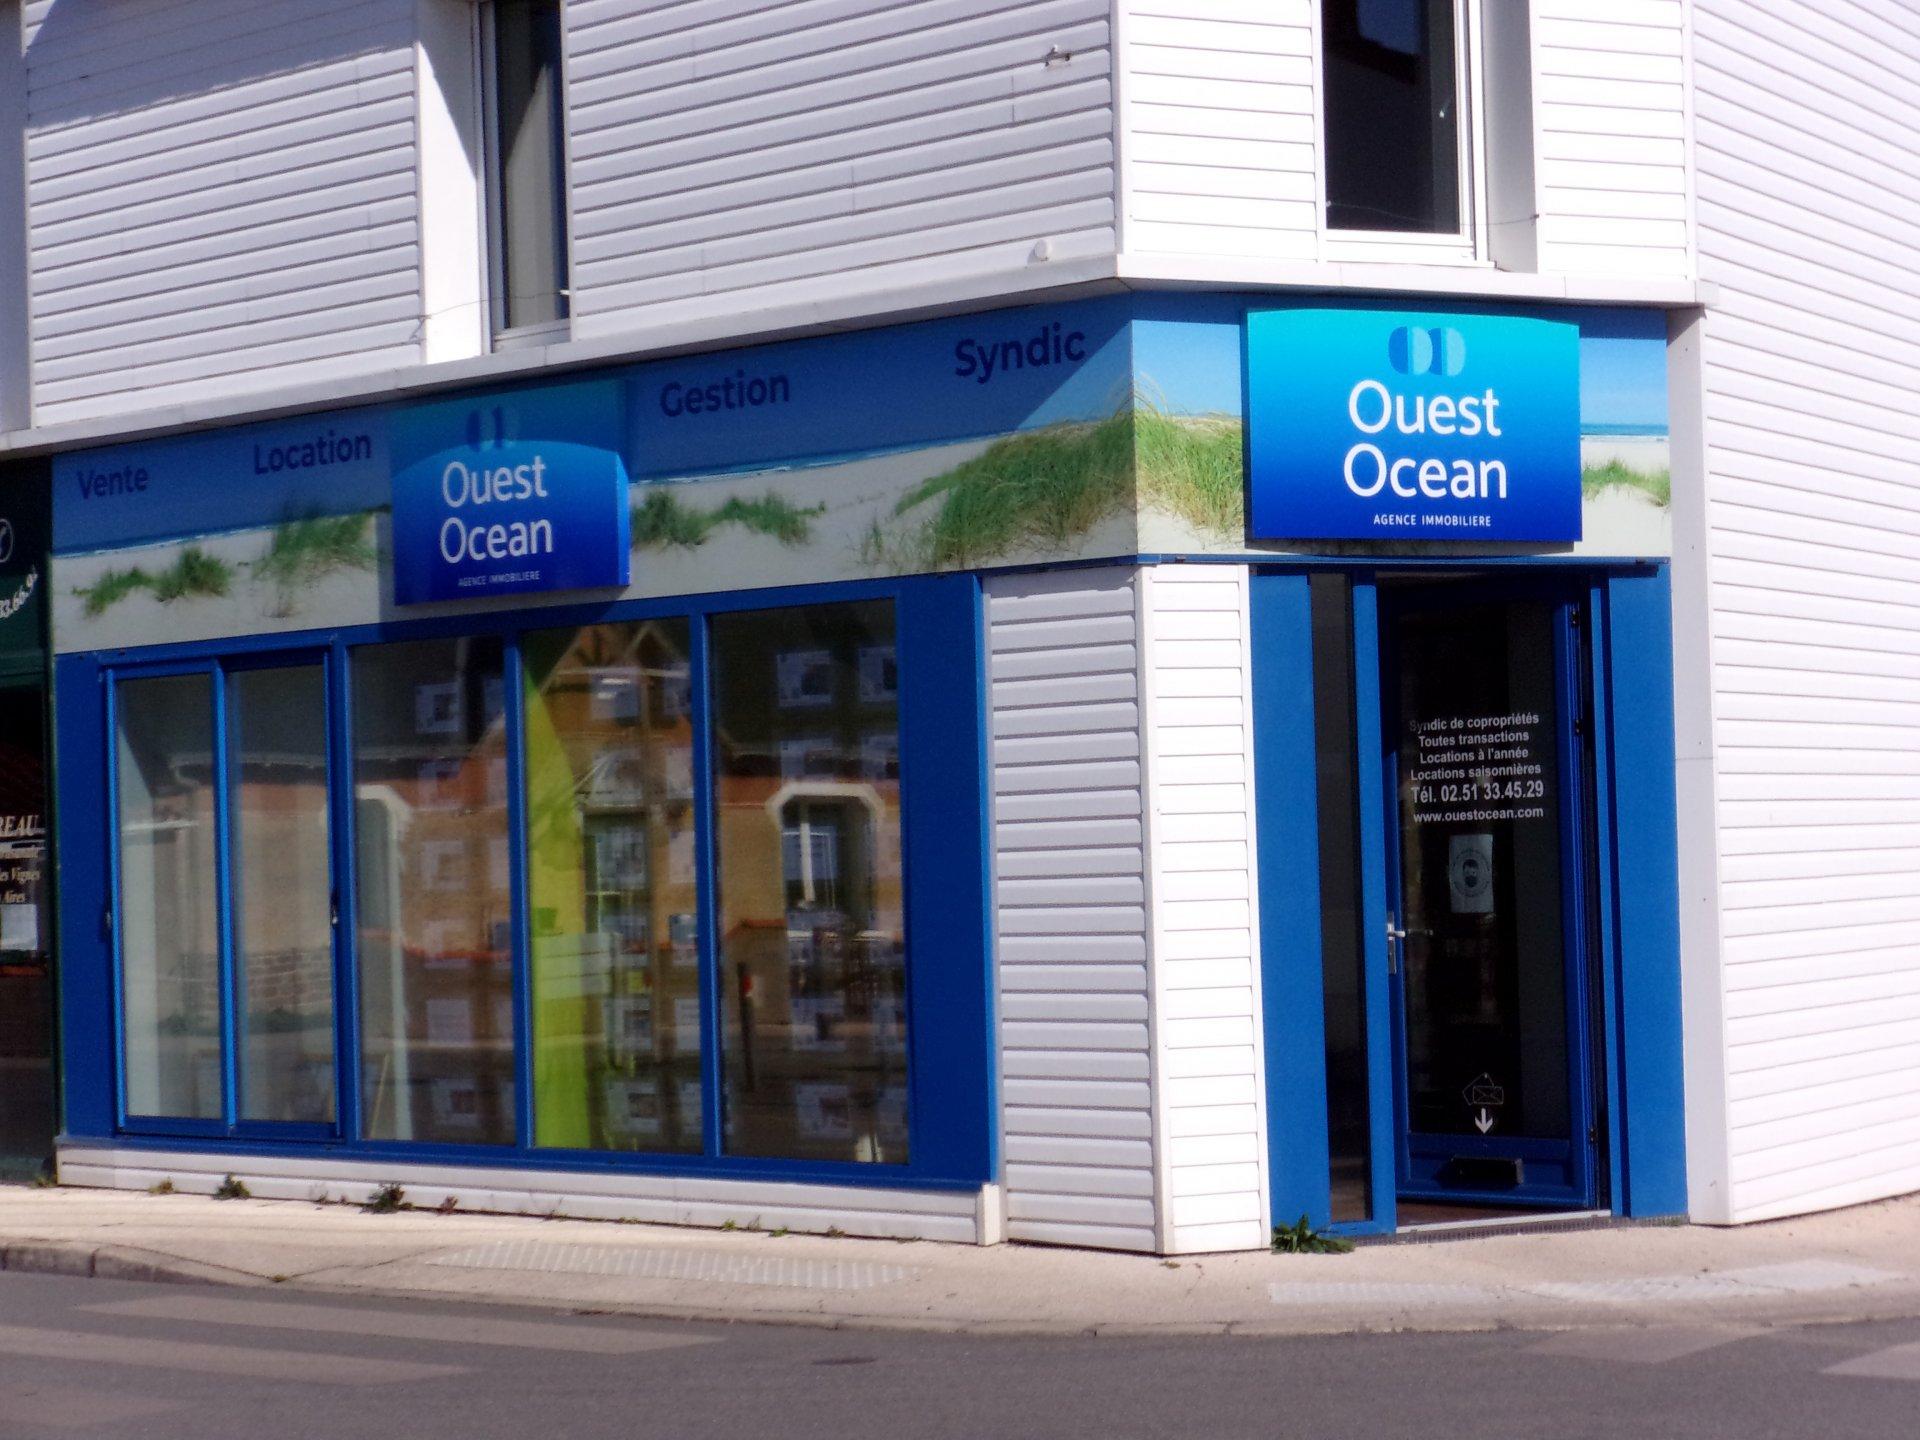 AGENCE OUEST OCEAN